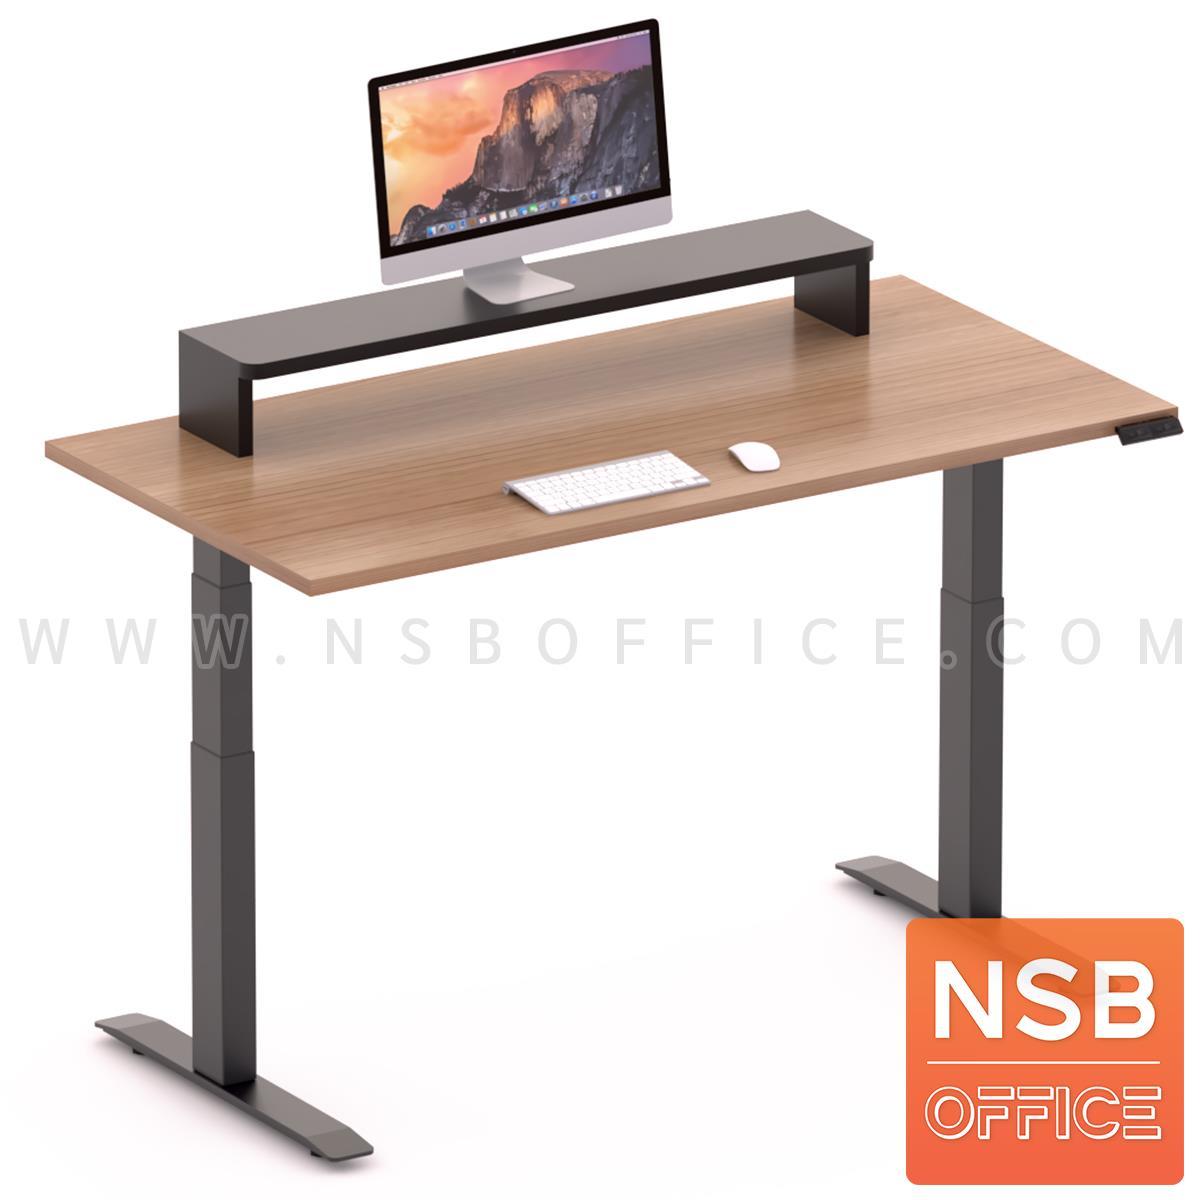 A10A107:โต๊ะทำงาน Sit 2 Stand ระบบไฟฟ้า รุ่น Flaxen (แฟลกซ์เซ็น) ขนาด 150W, 180W cm. พร้อมชั้นวางจอคอมพิวเตอร์